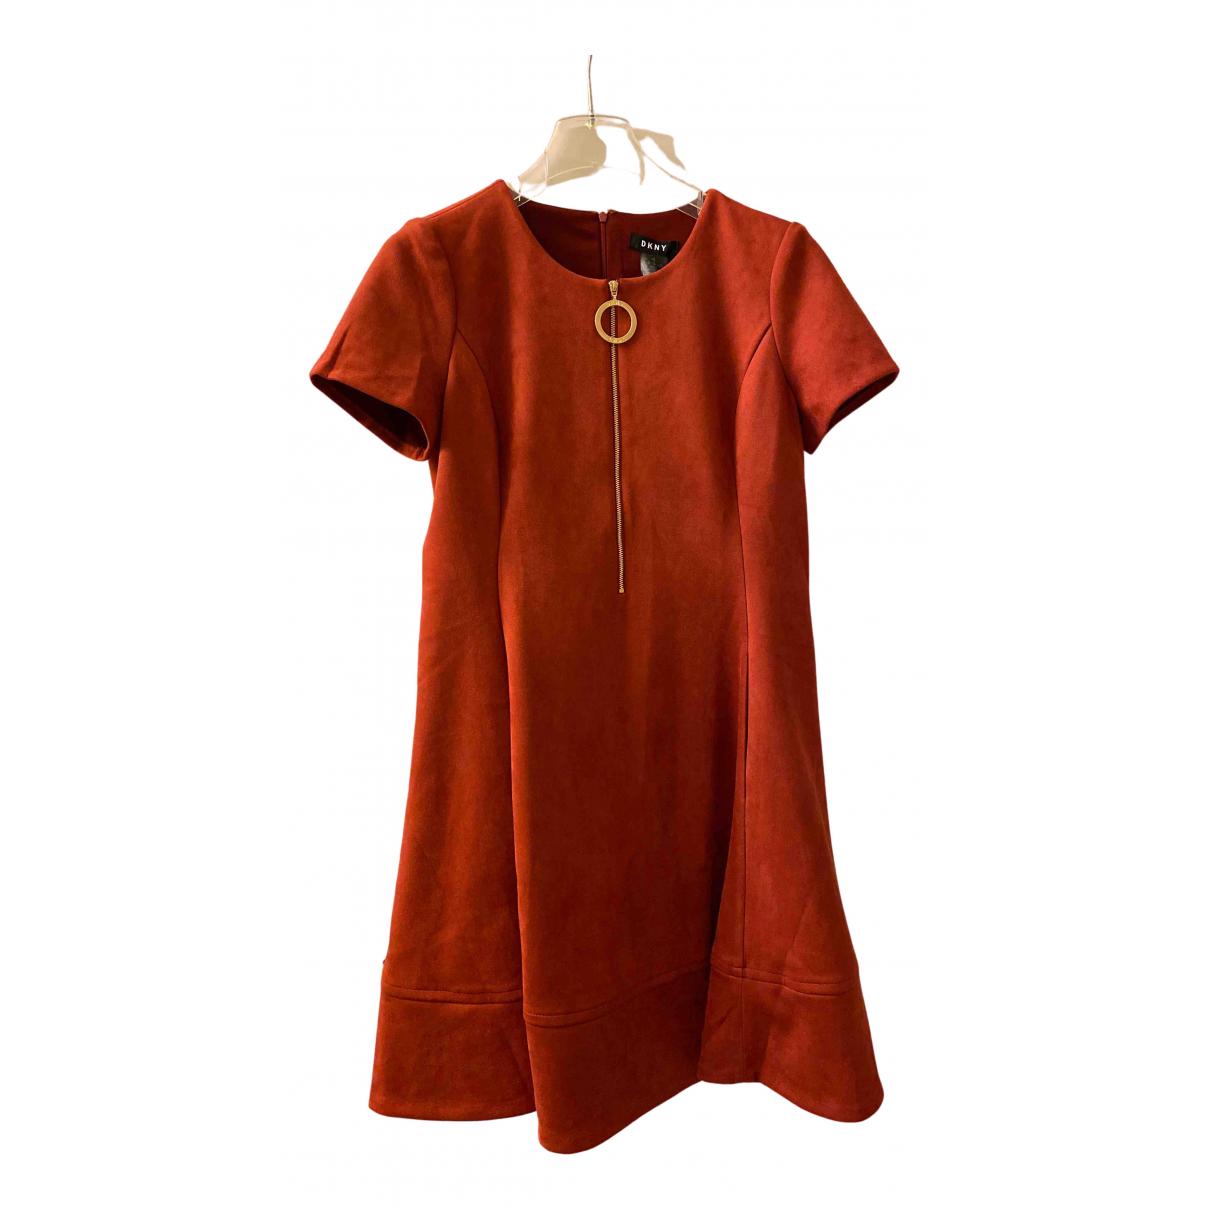 Dkny - Robe   pour femme en coton - elasthane - bordeaux